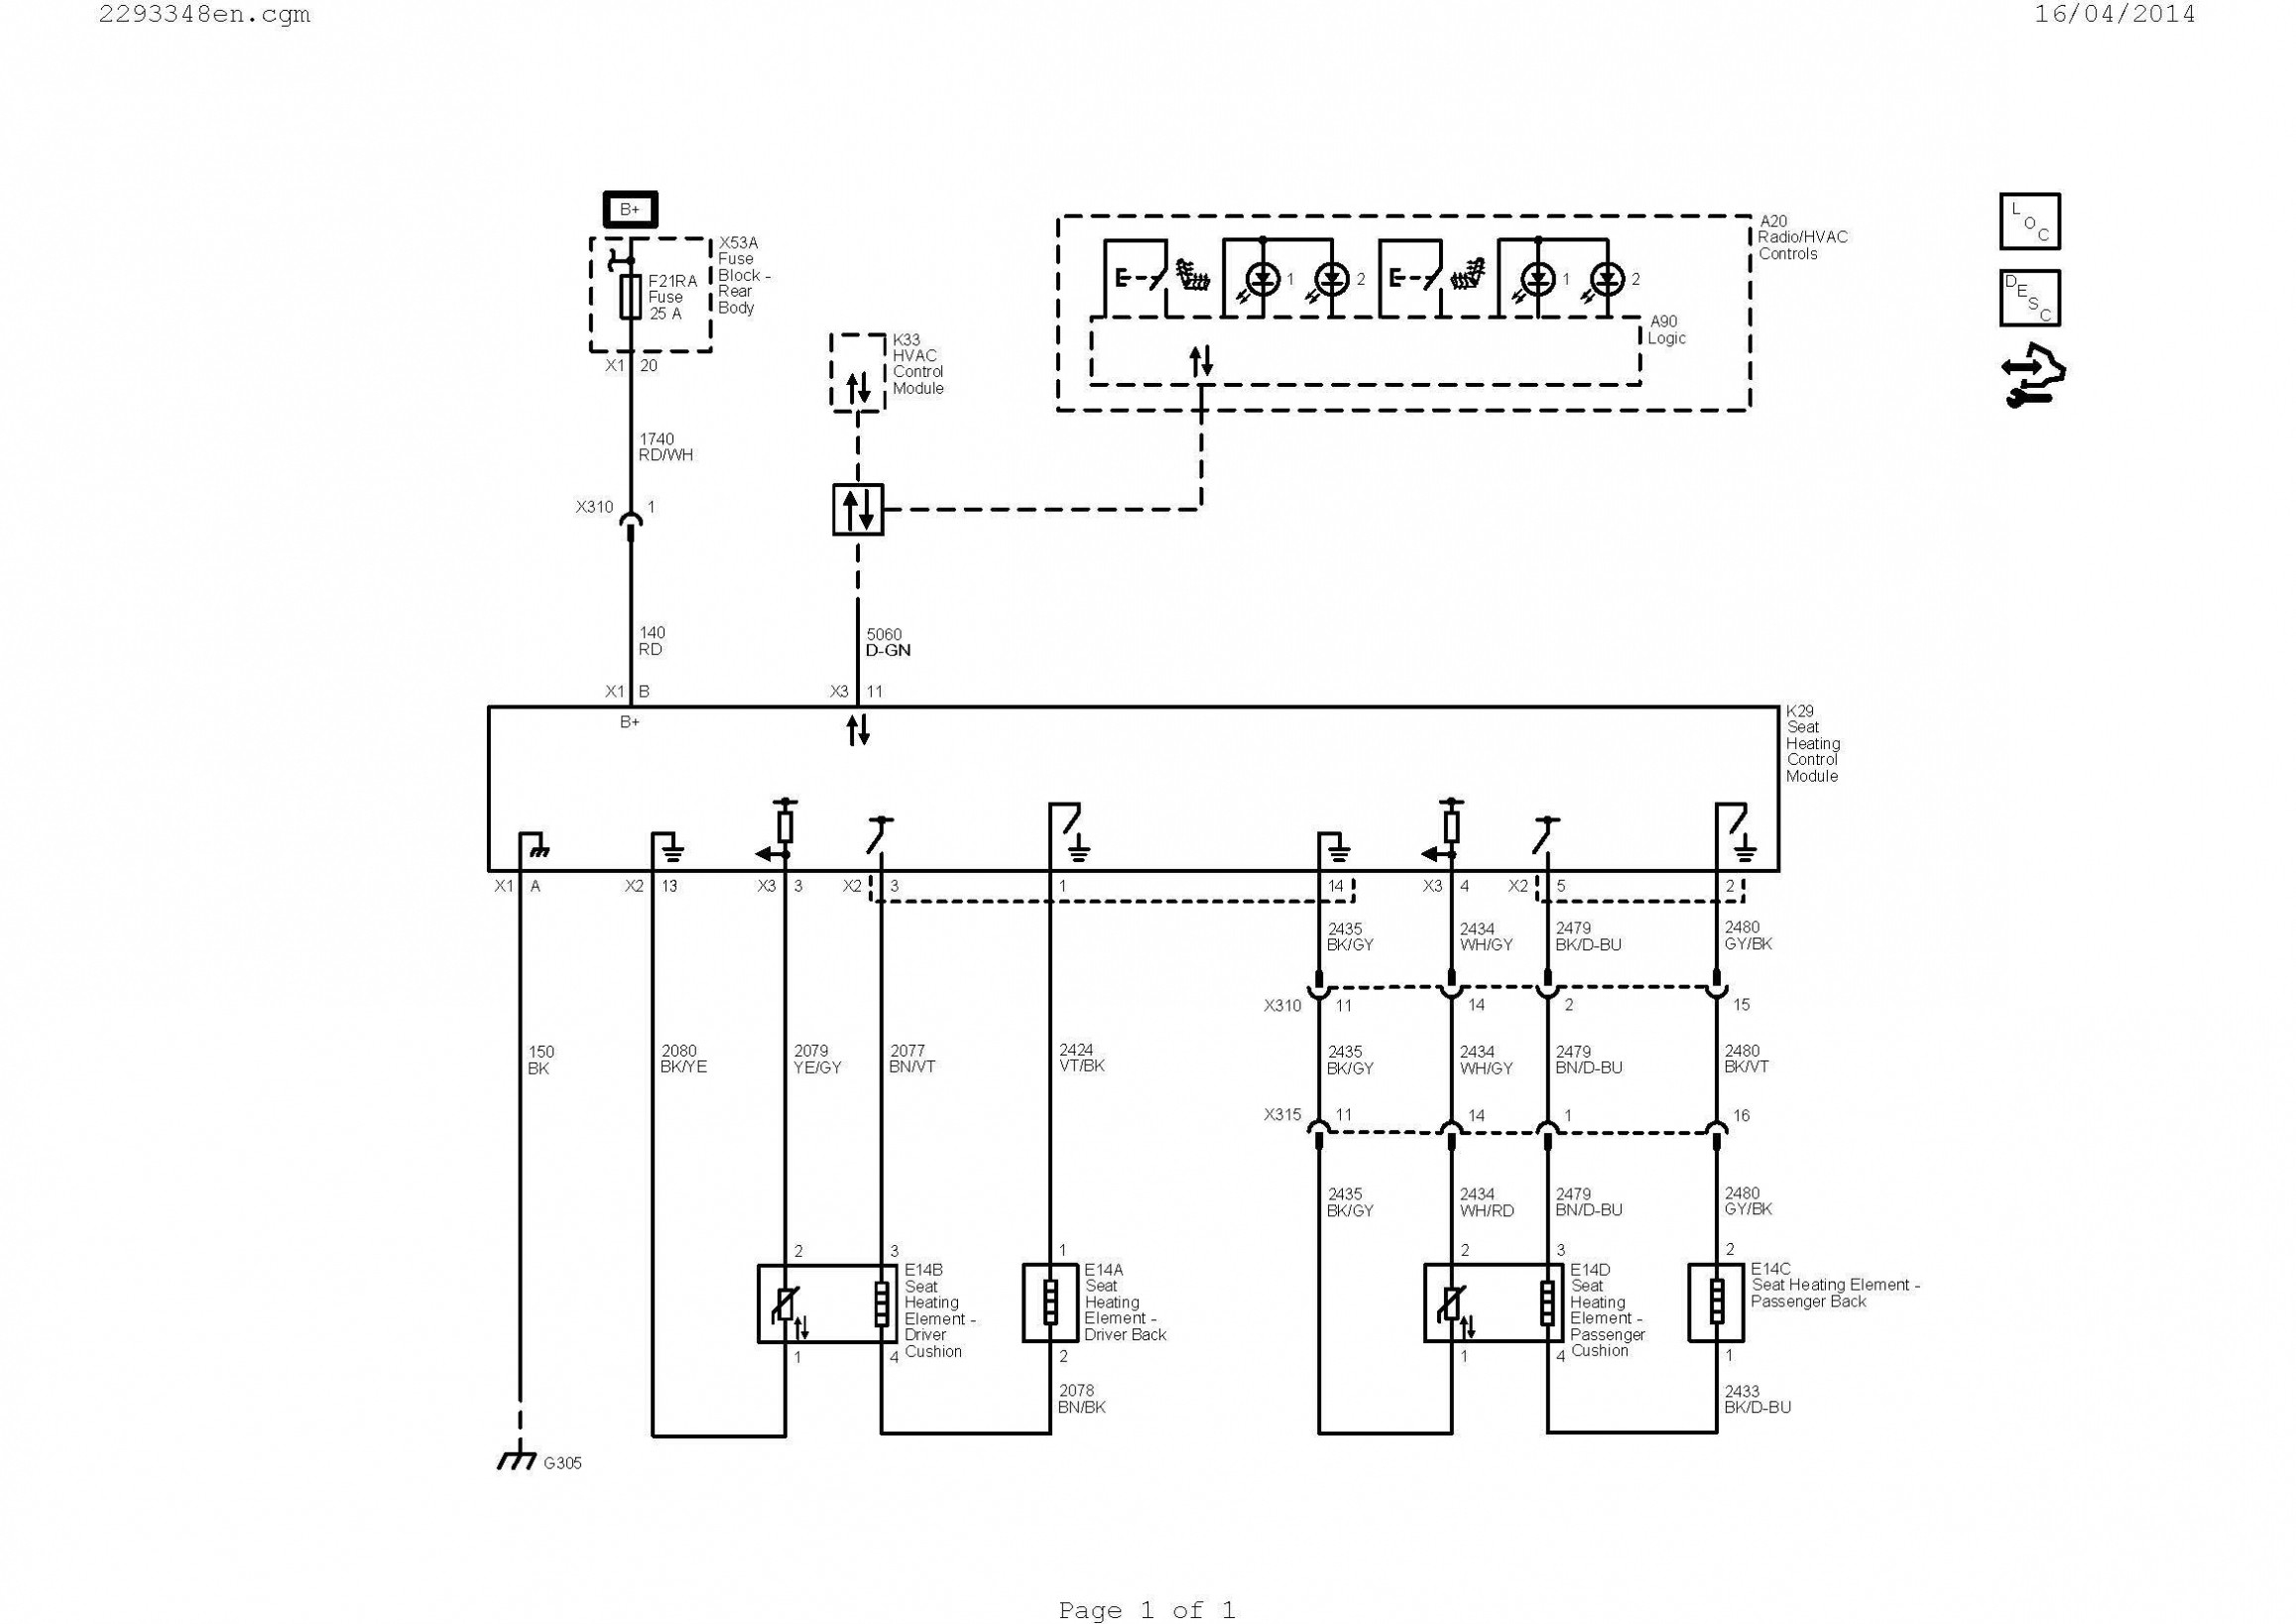 3 Phase Motor Wiring Diagram 9 Leads Elegant 3 Phase Wire Diagram - 3 Phase Motor Wiring Diagram 9 Leads